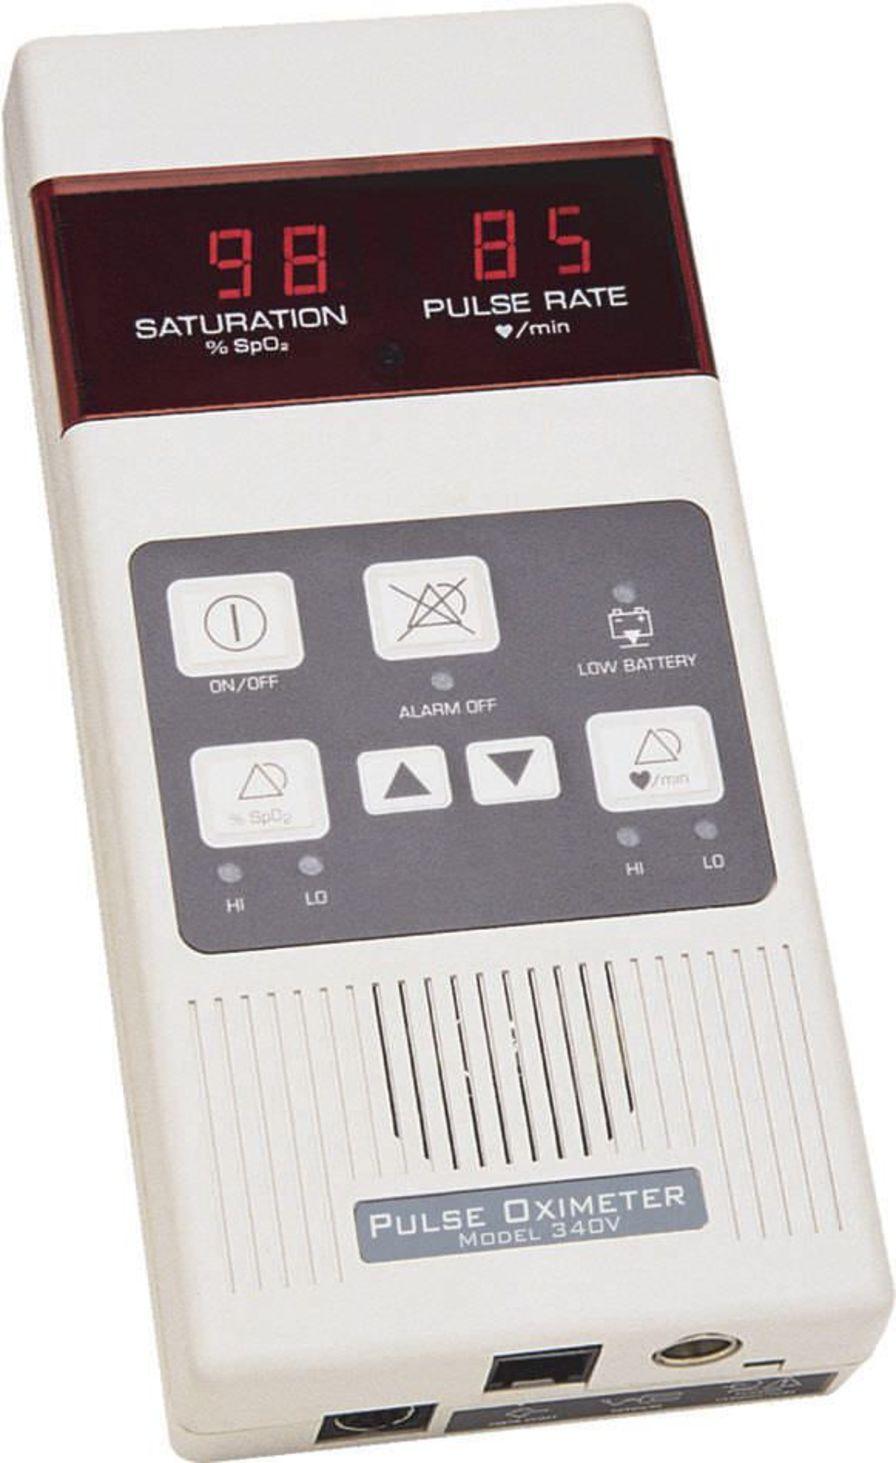 Pulse oximeter with separate sensor / handheld / veterinary 0-100 % SpO2 | MODEL 340VT Mediaid Inc.